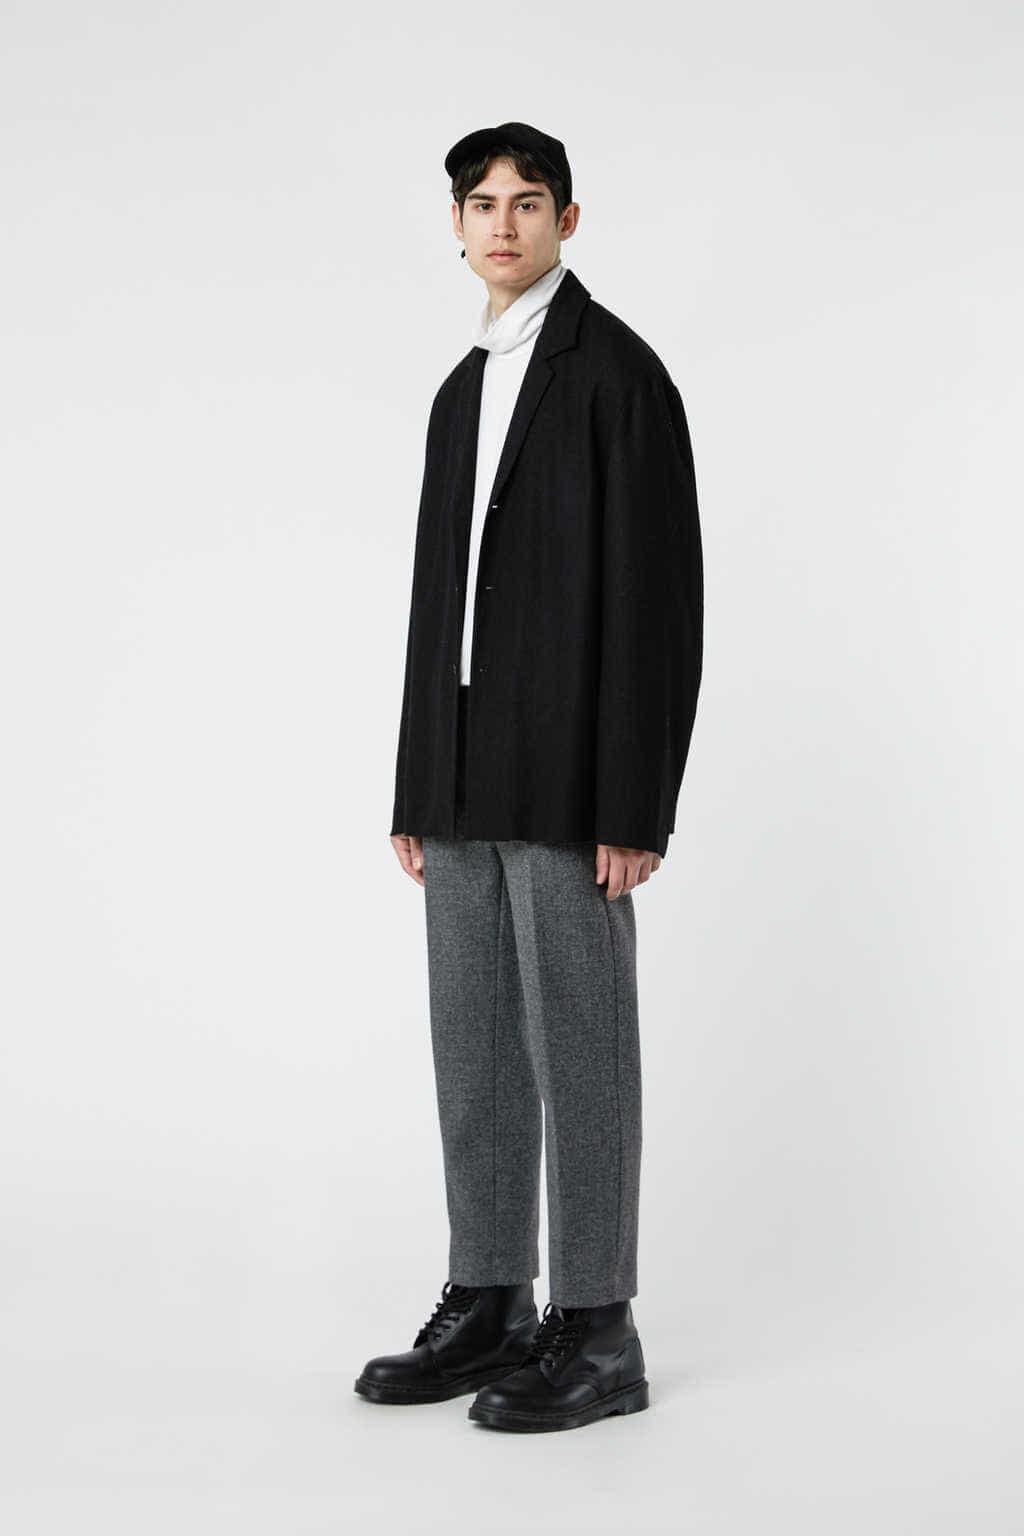 Jacket J002M Black 8